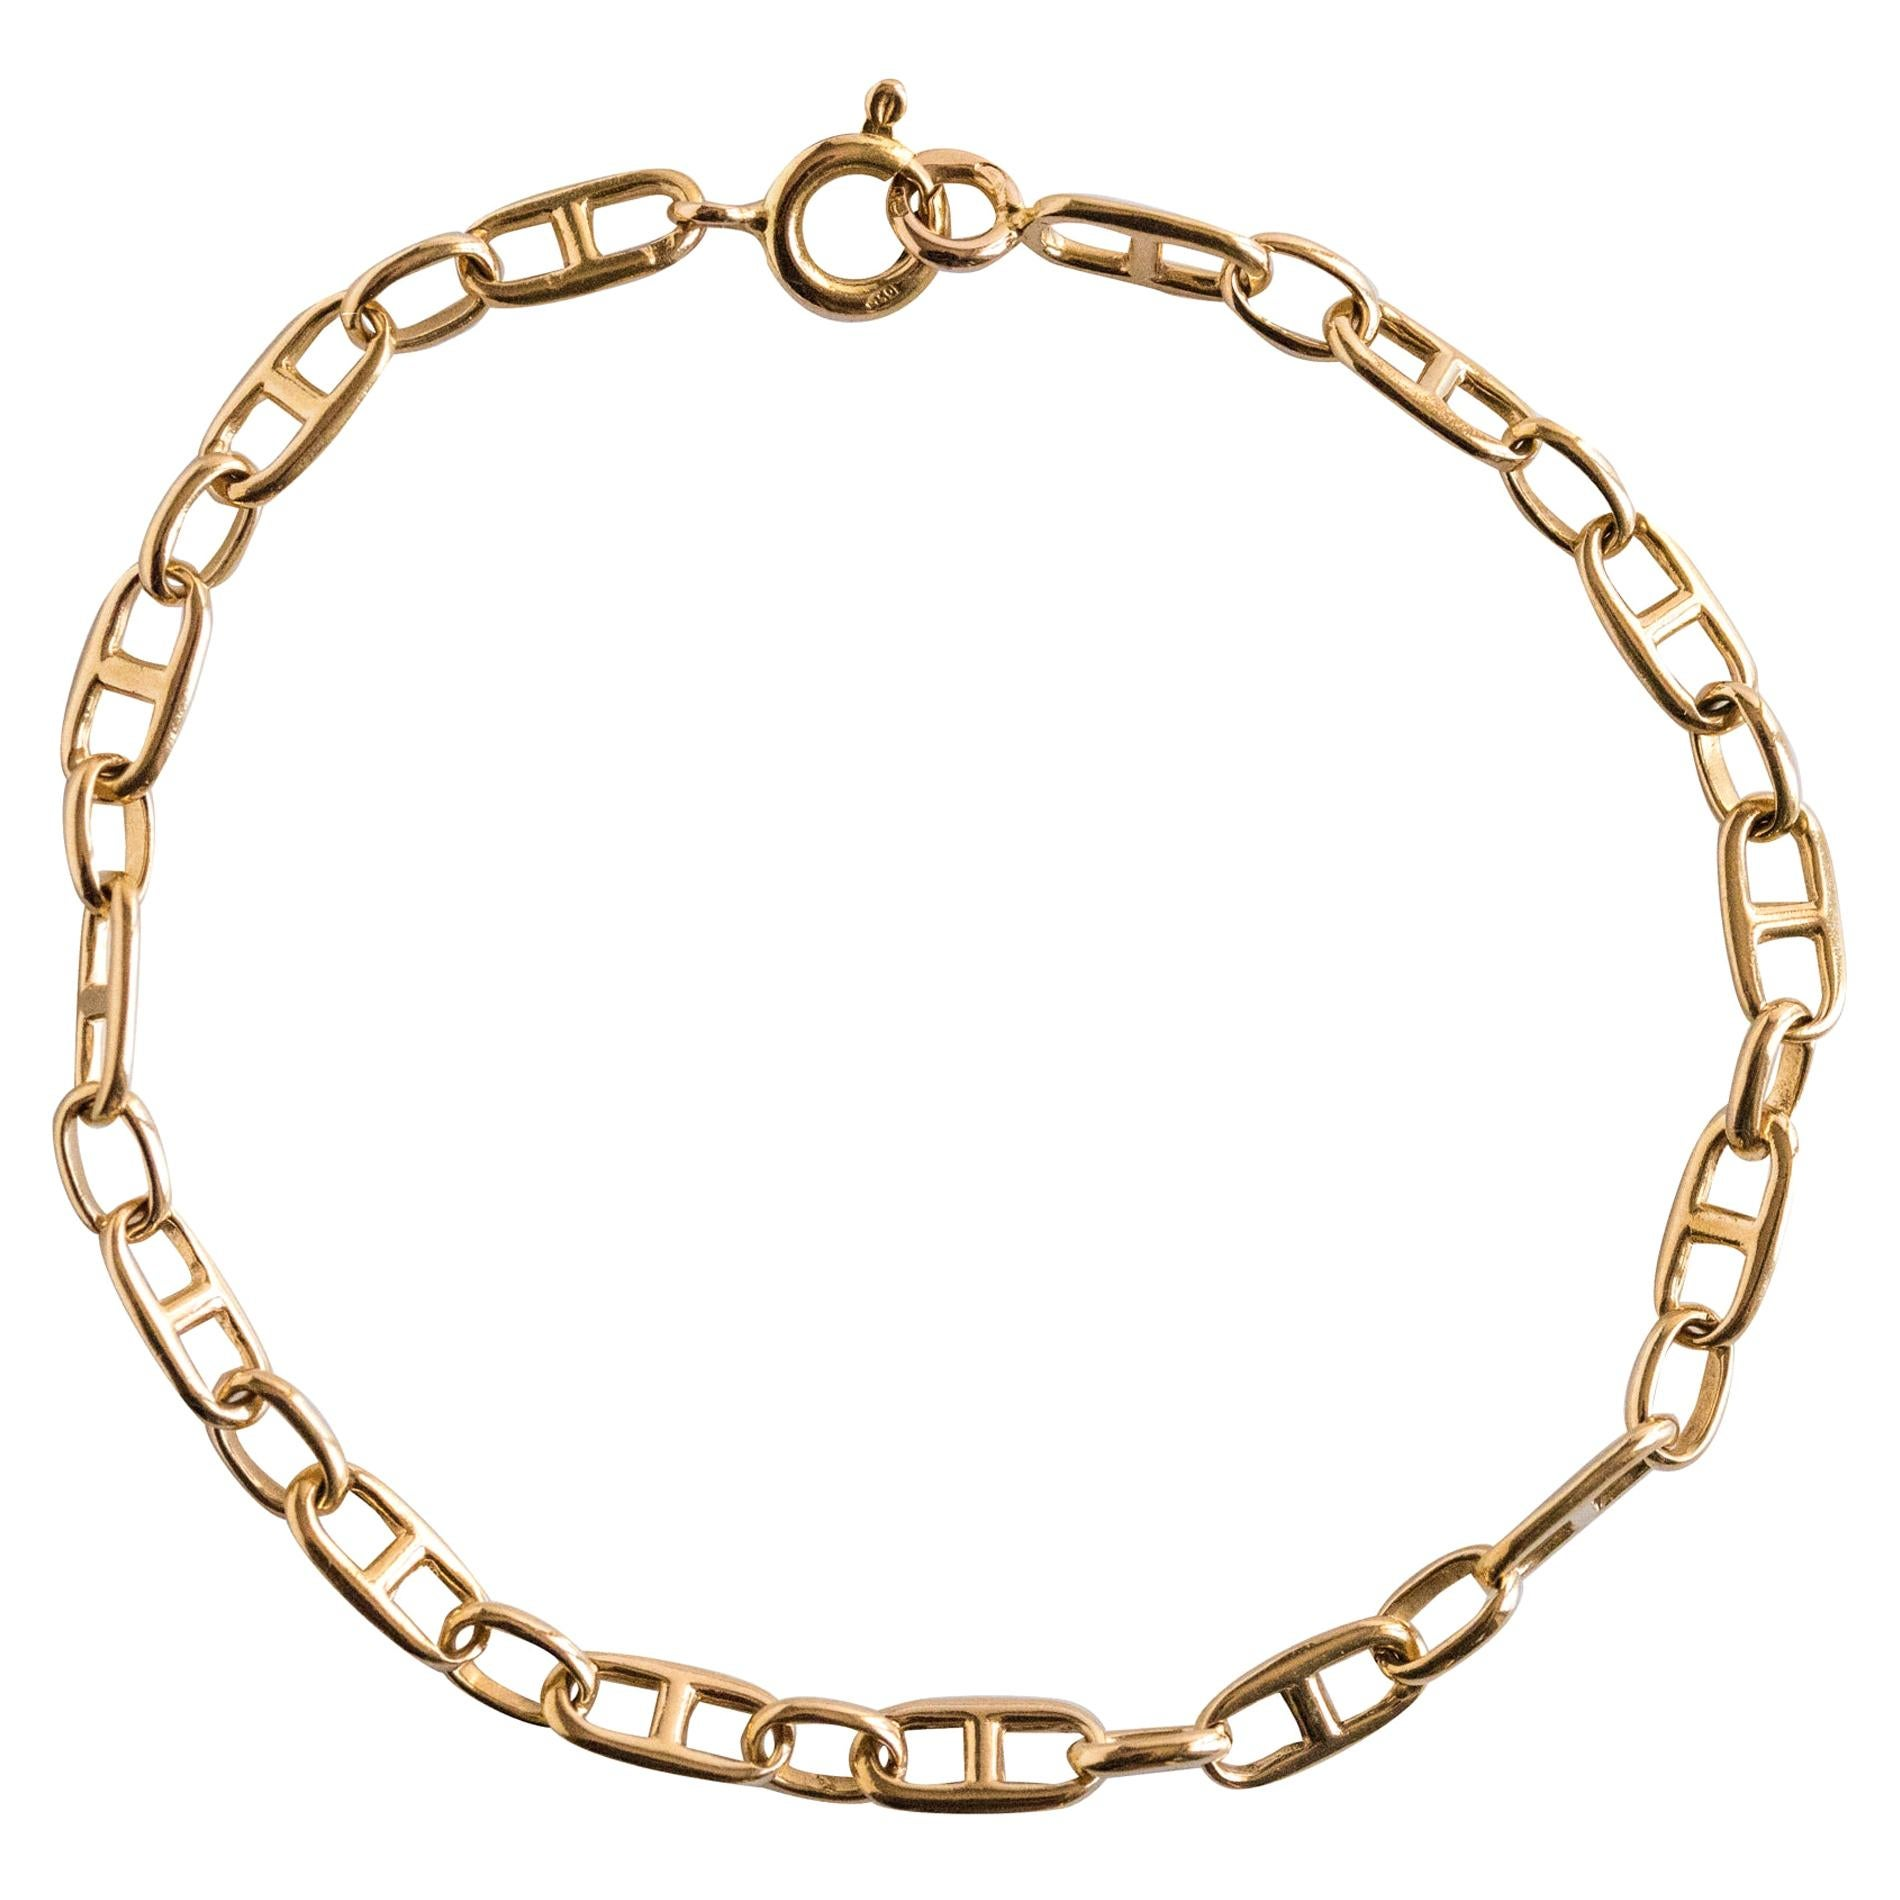 Modern 18 Karat Yellow Gold Navy Link Curb Bracelet